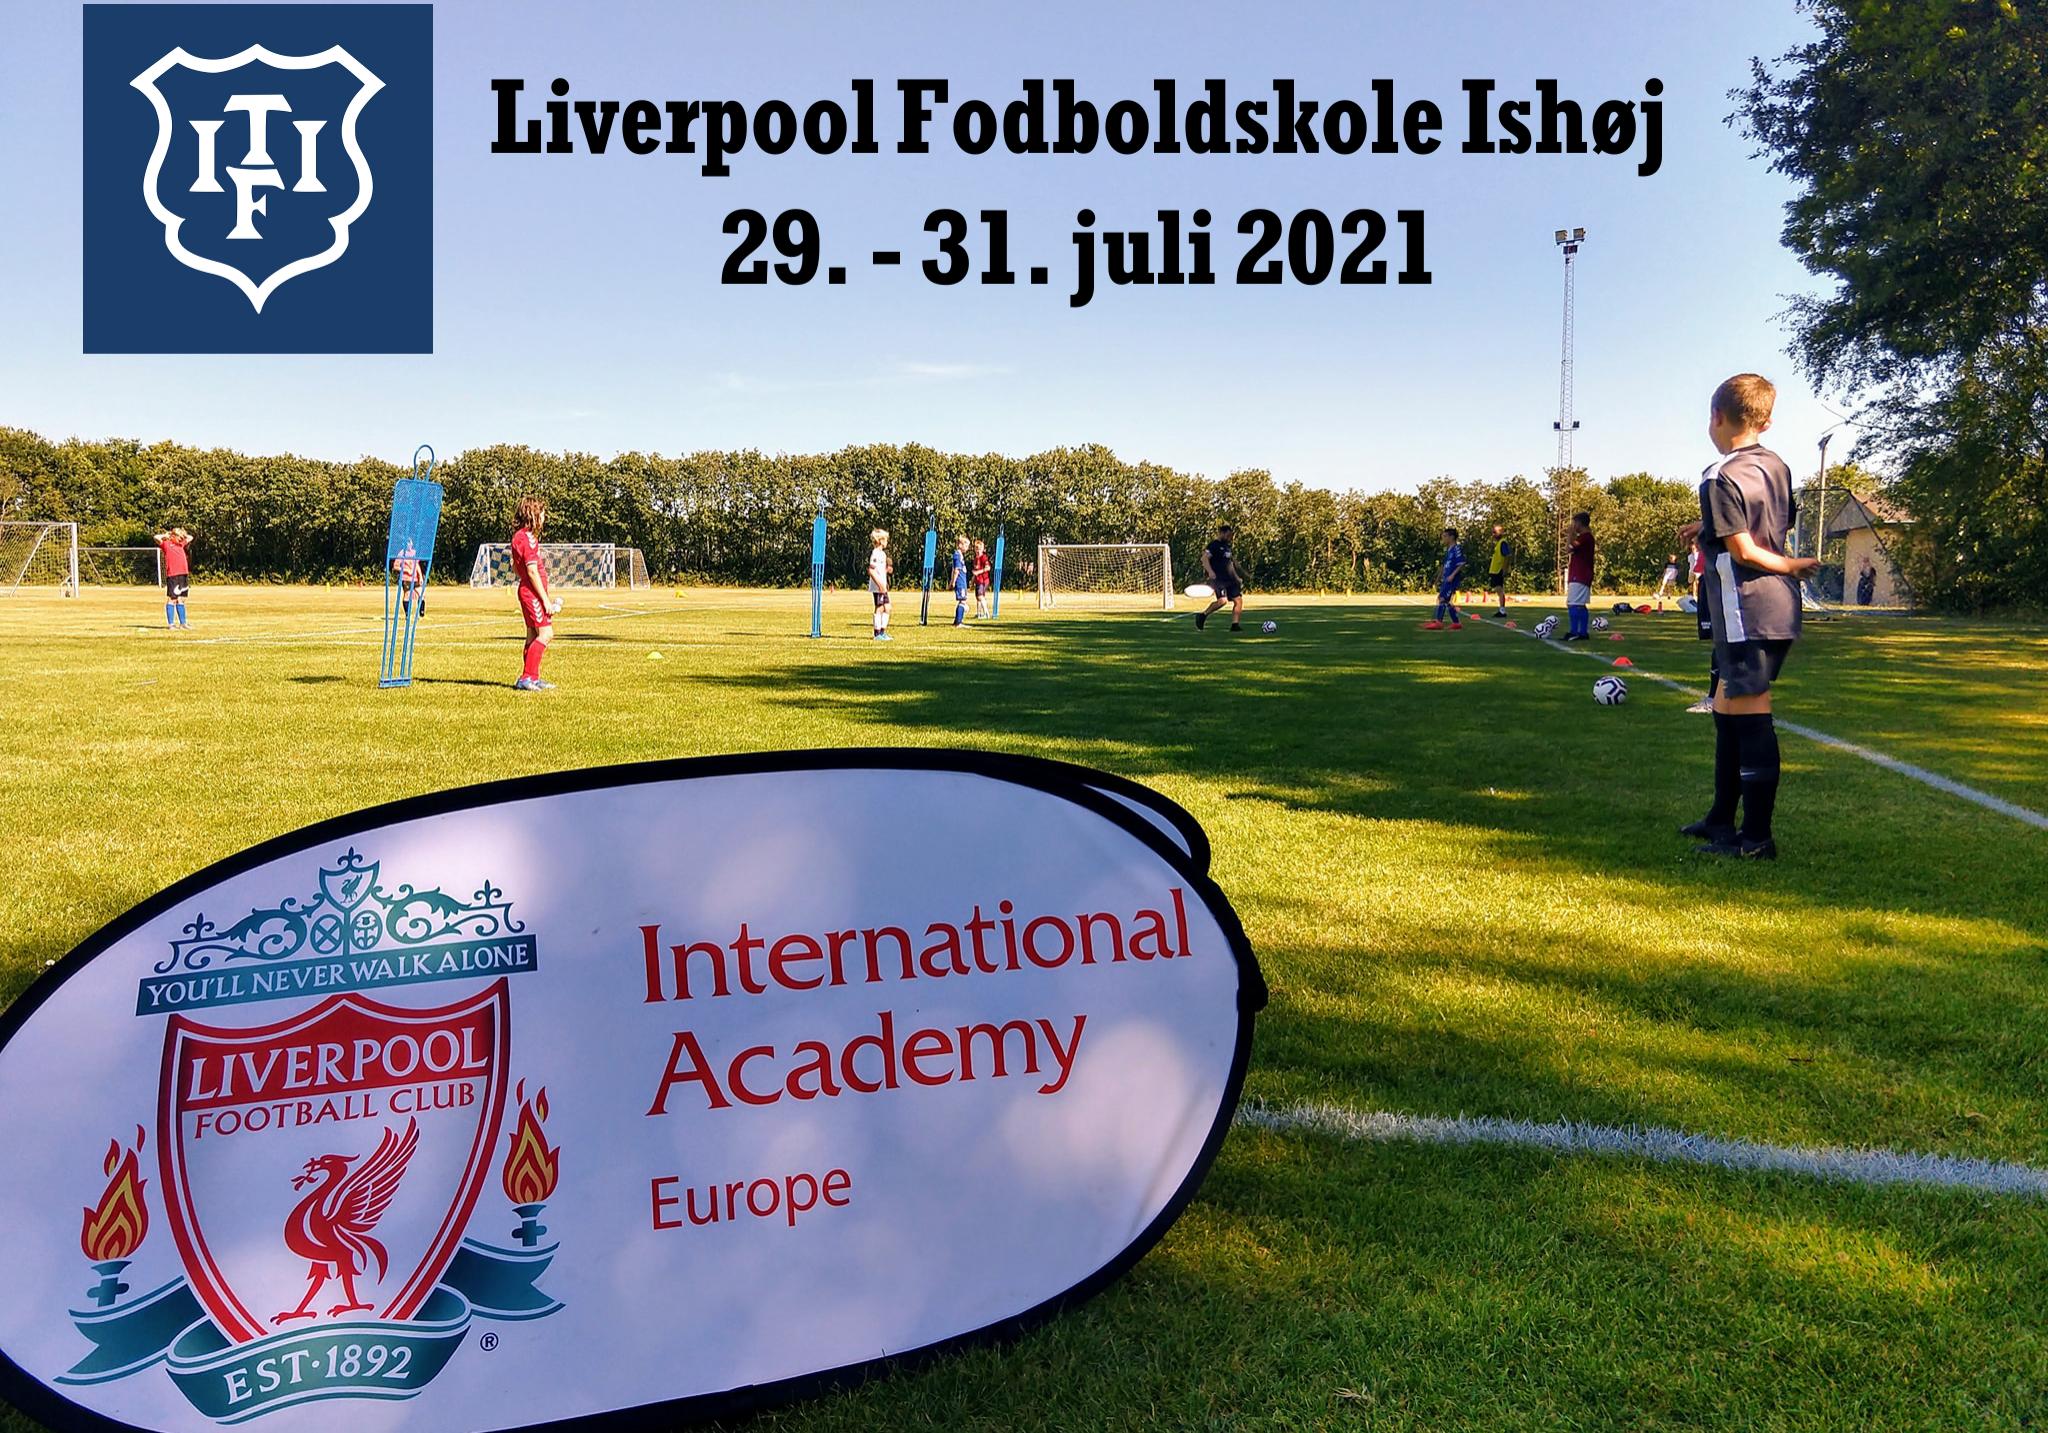 Liverpool Fodboldskole Ishøj